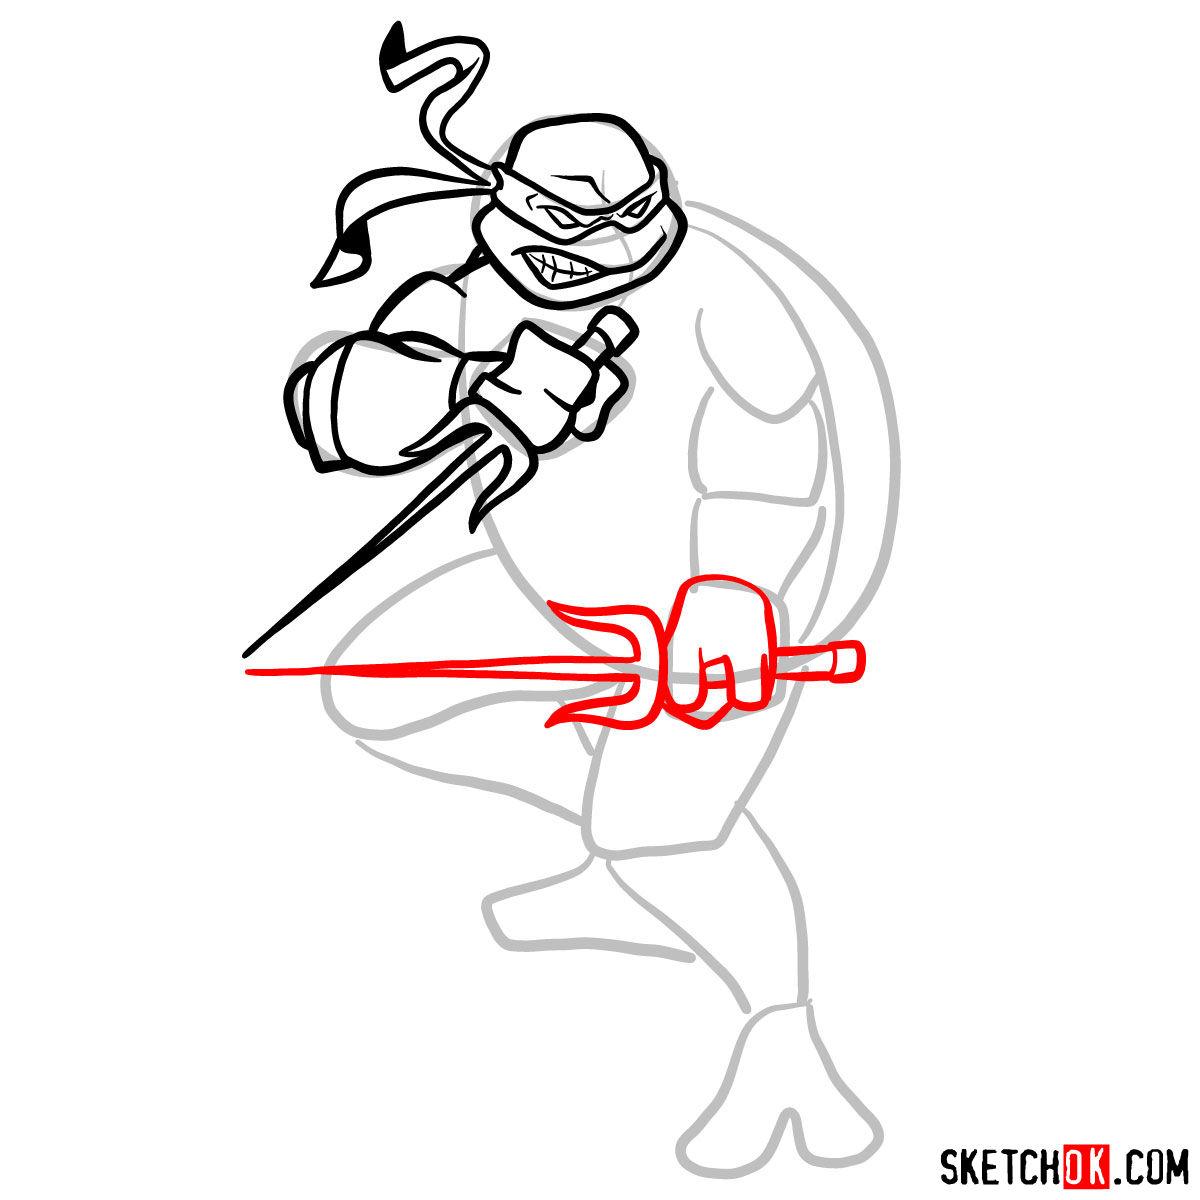 How To Draw Angry Raphael Teenage Mutant Ninja Turtle Step By